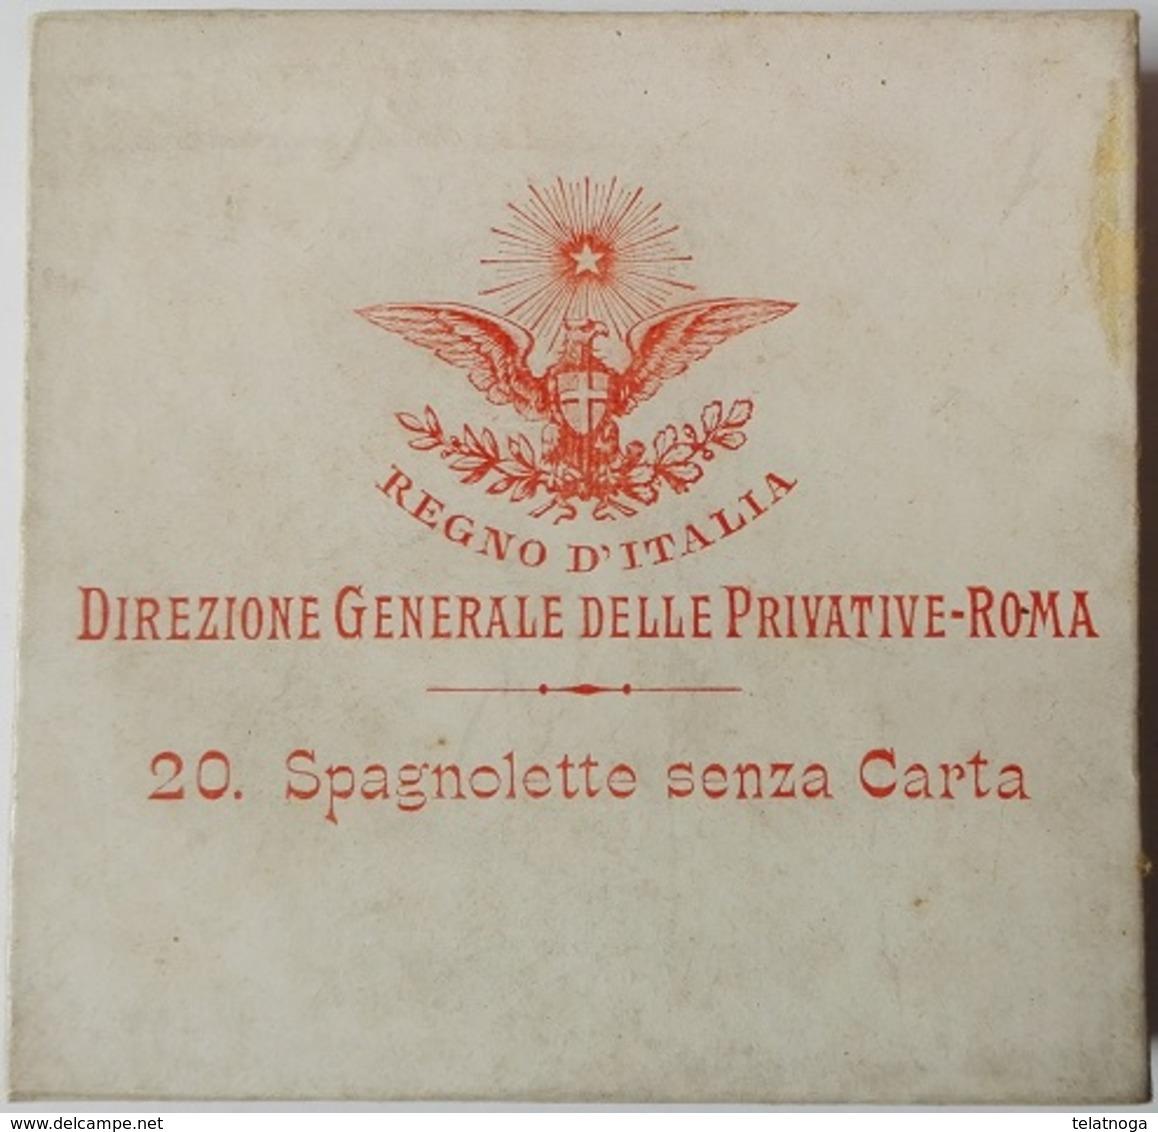 RARISSIMA SCATOLINA PIENA SIGILLATA SIGARETTE SPAGNOLETTE SENZA CARTA 1910 - Schnupftabakdosen (leer)